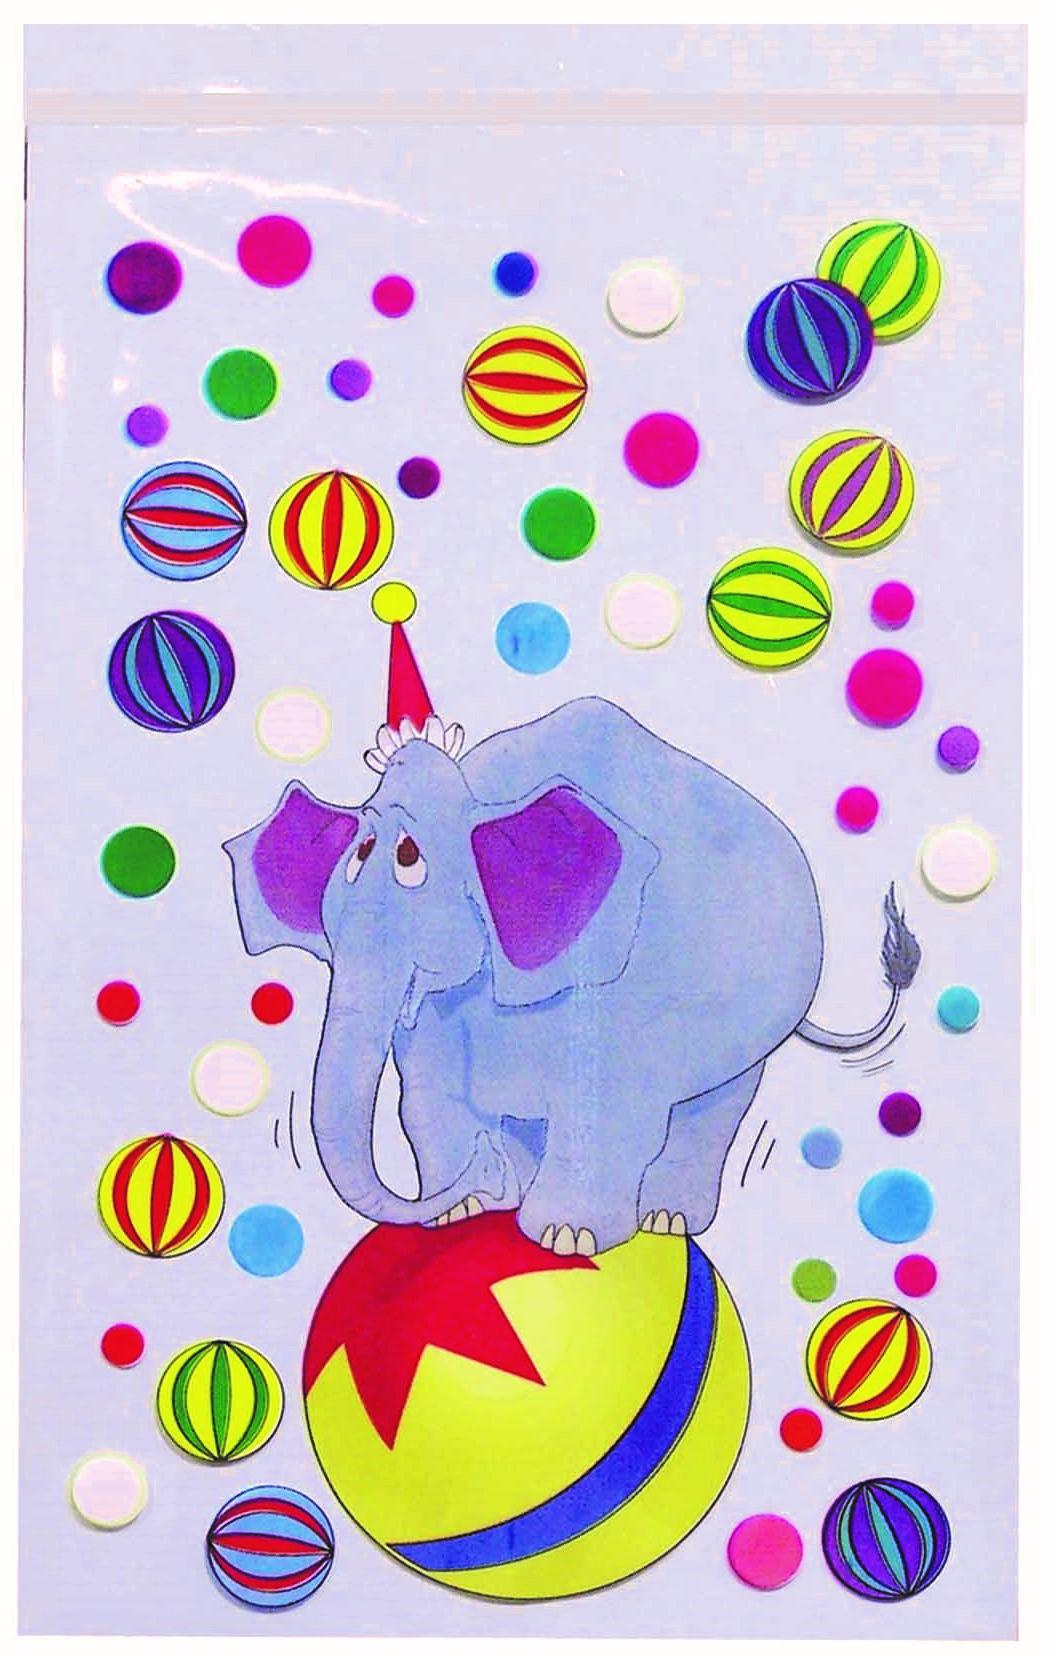 40799 Bolsa 20X30 Con Adhesivo Elefante Image